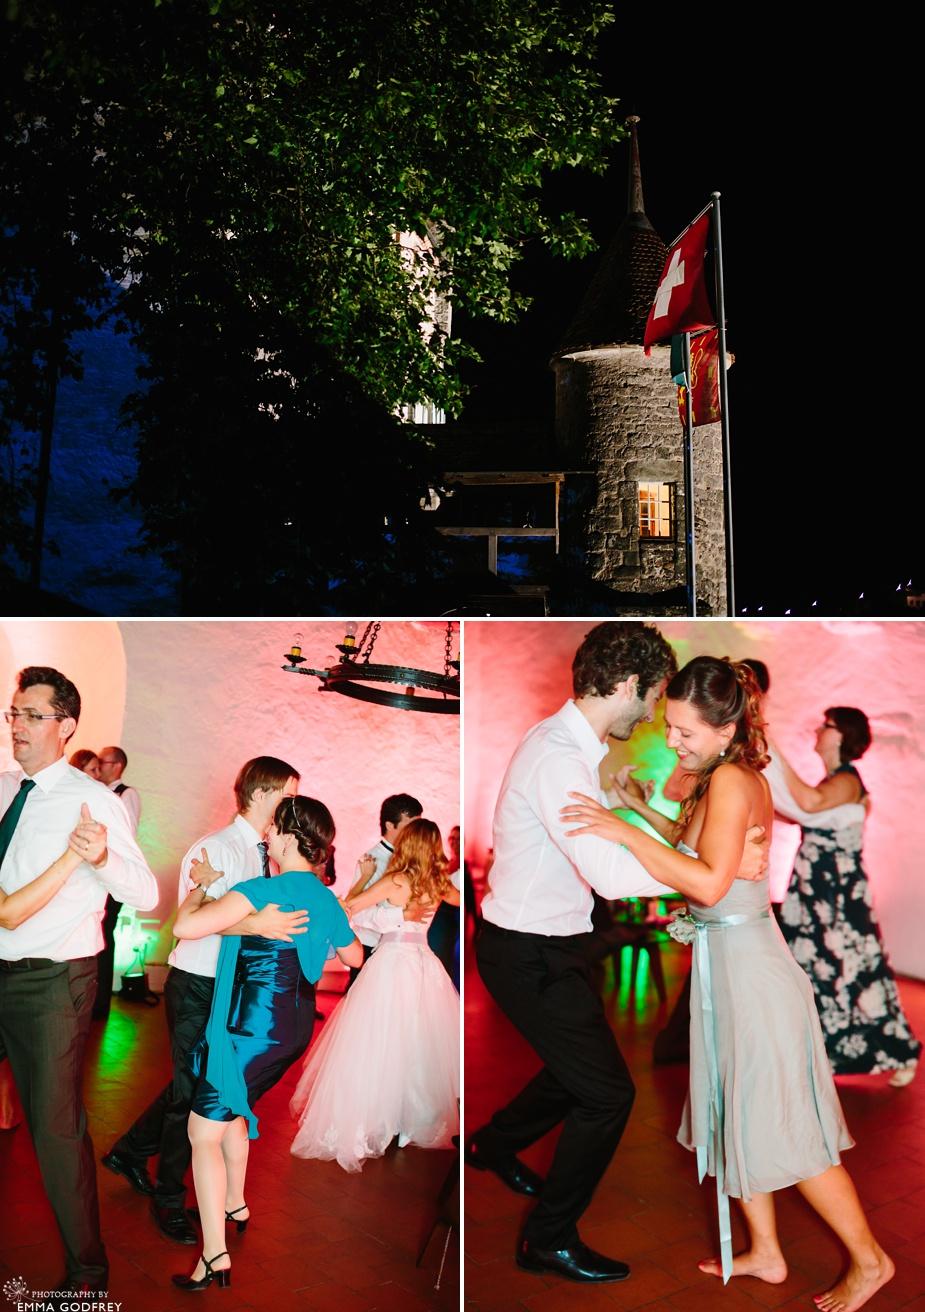 45-Fairytale-Wedding-Oron-0062.jpg